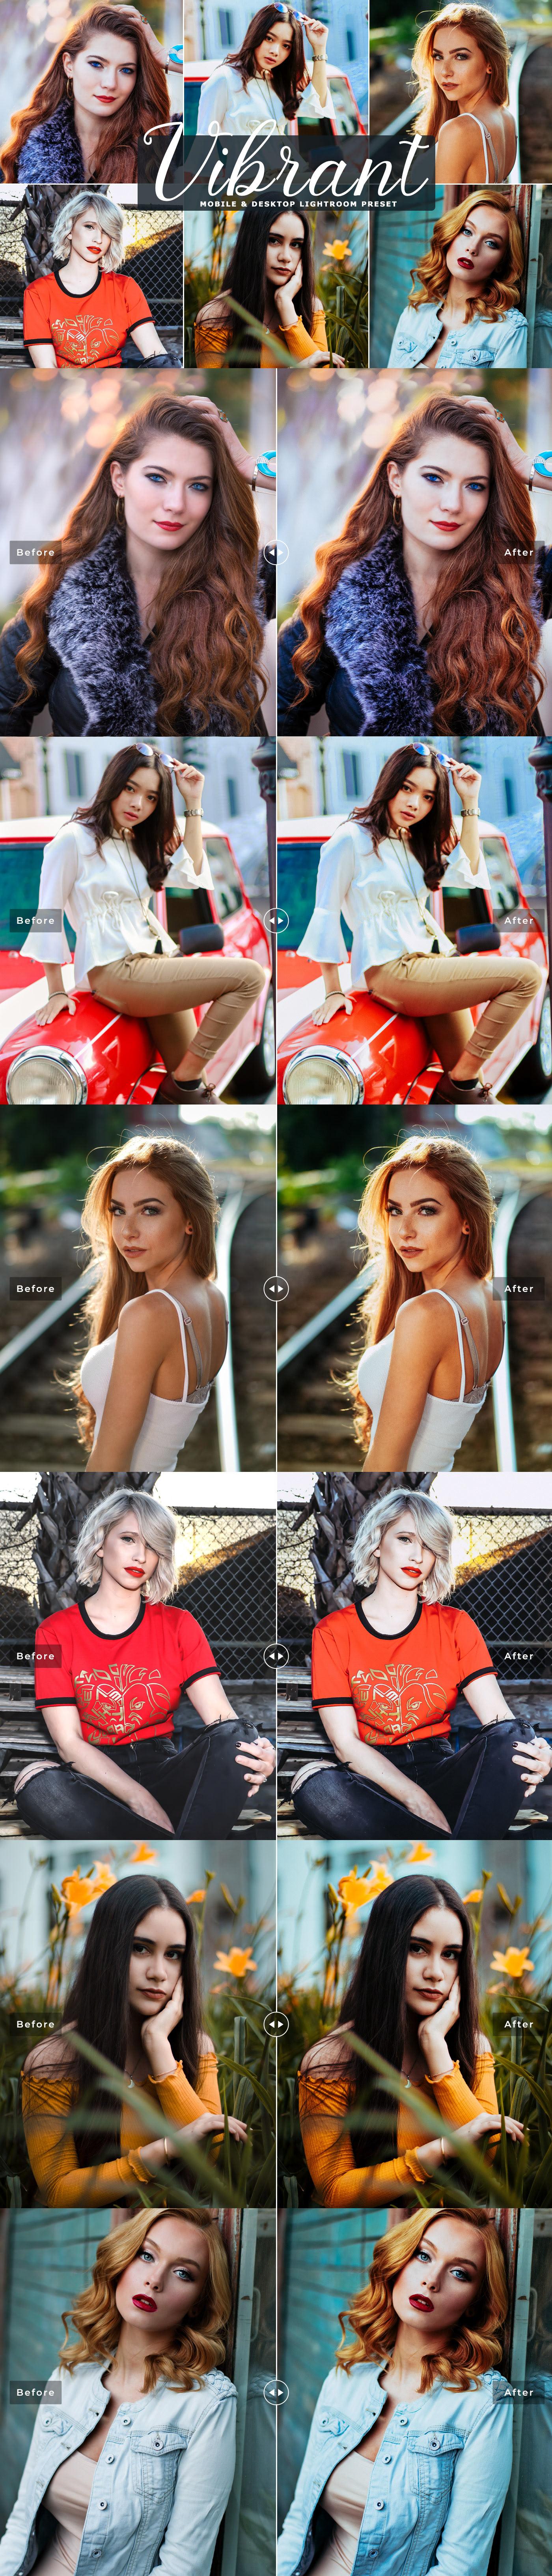 acr preset Beautiful Preset best lightroom cameraraw preset clean blogger instagram filter vibrant preset wedding